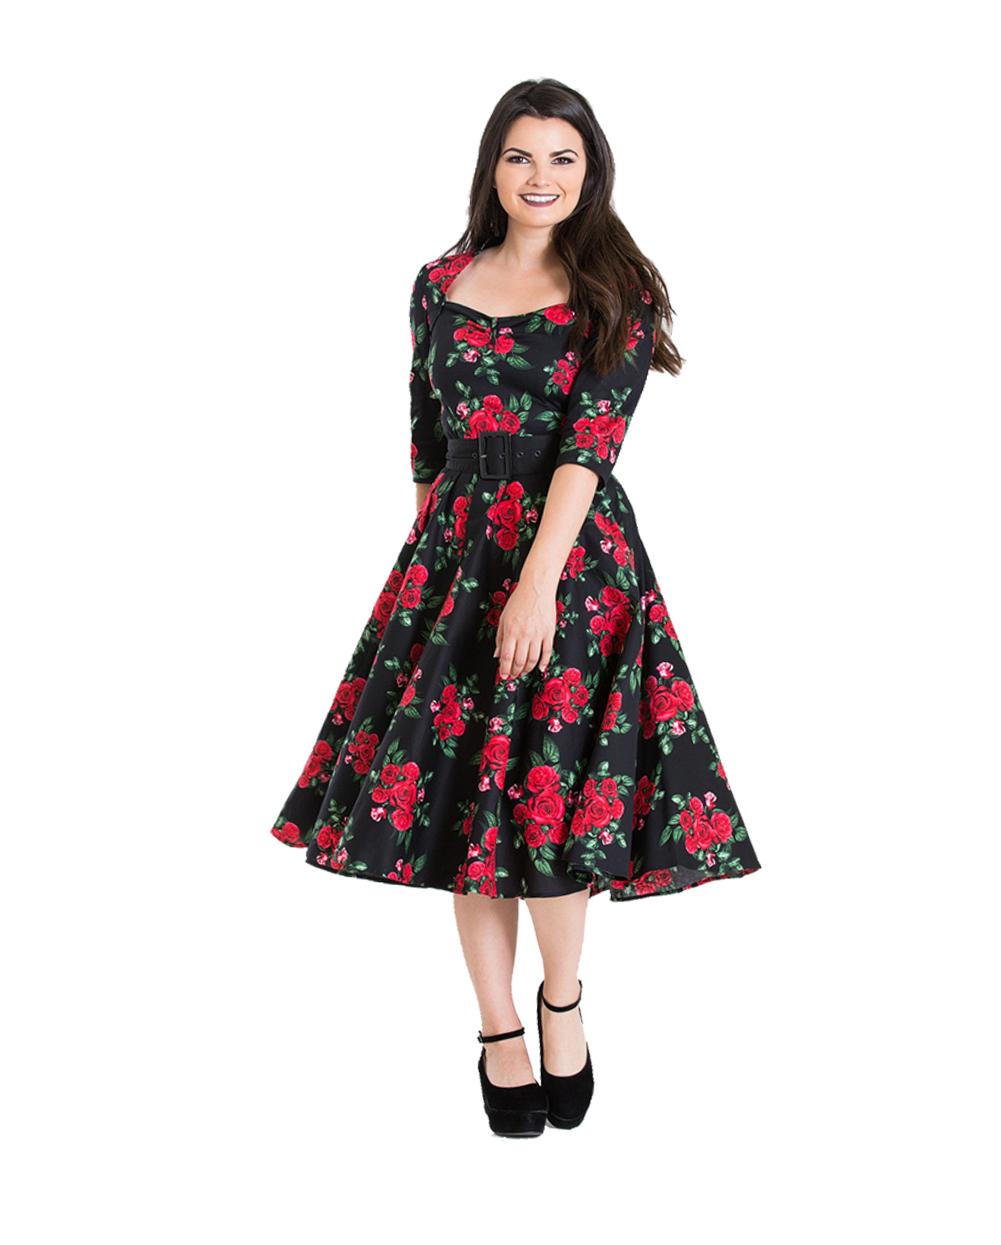 Langarm Von Bunny 50er Rosen Retro Hell Kleid Jahre Petticoat Swing xdEWQrCBeo